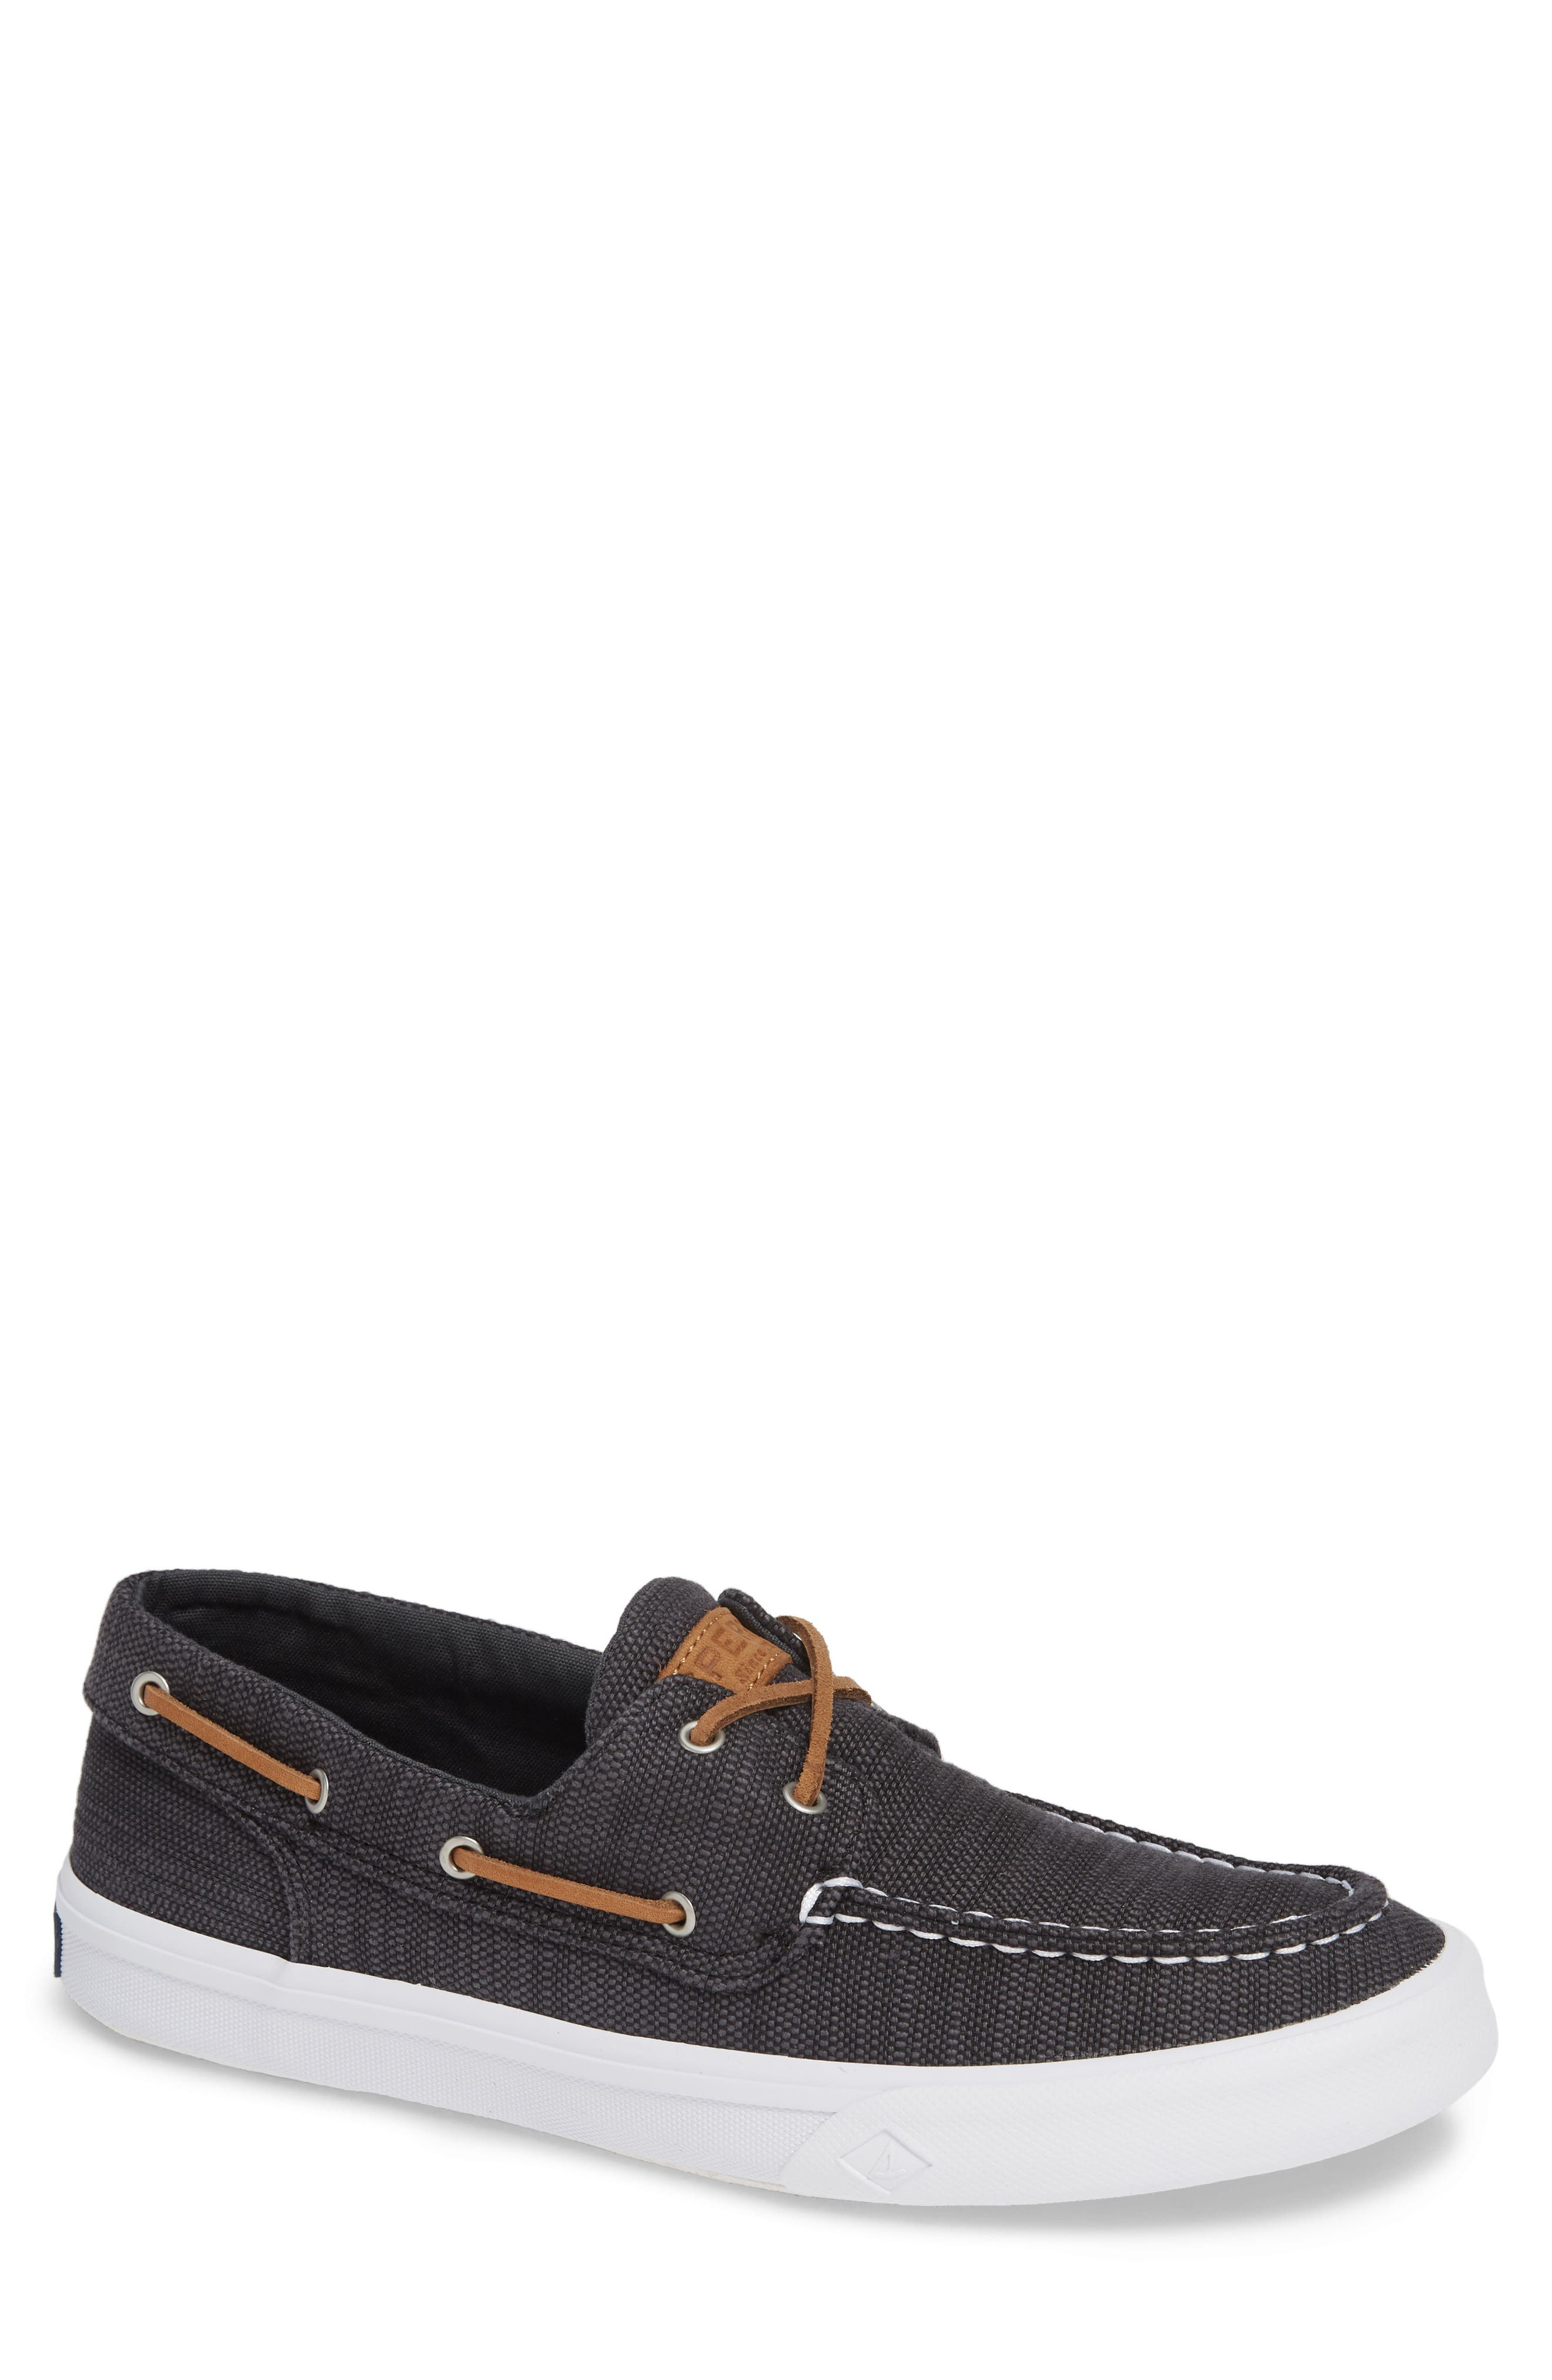 Sperry Bahama II Baja Boat Shoe (Men